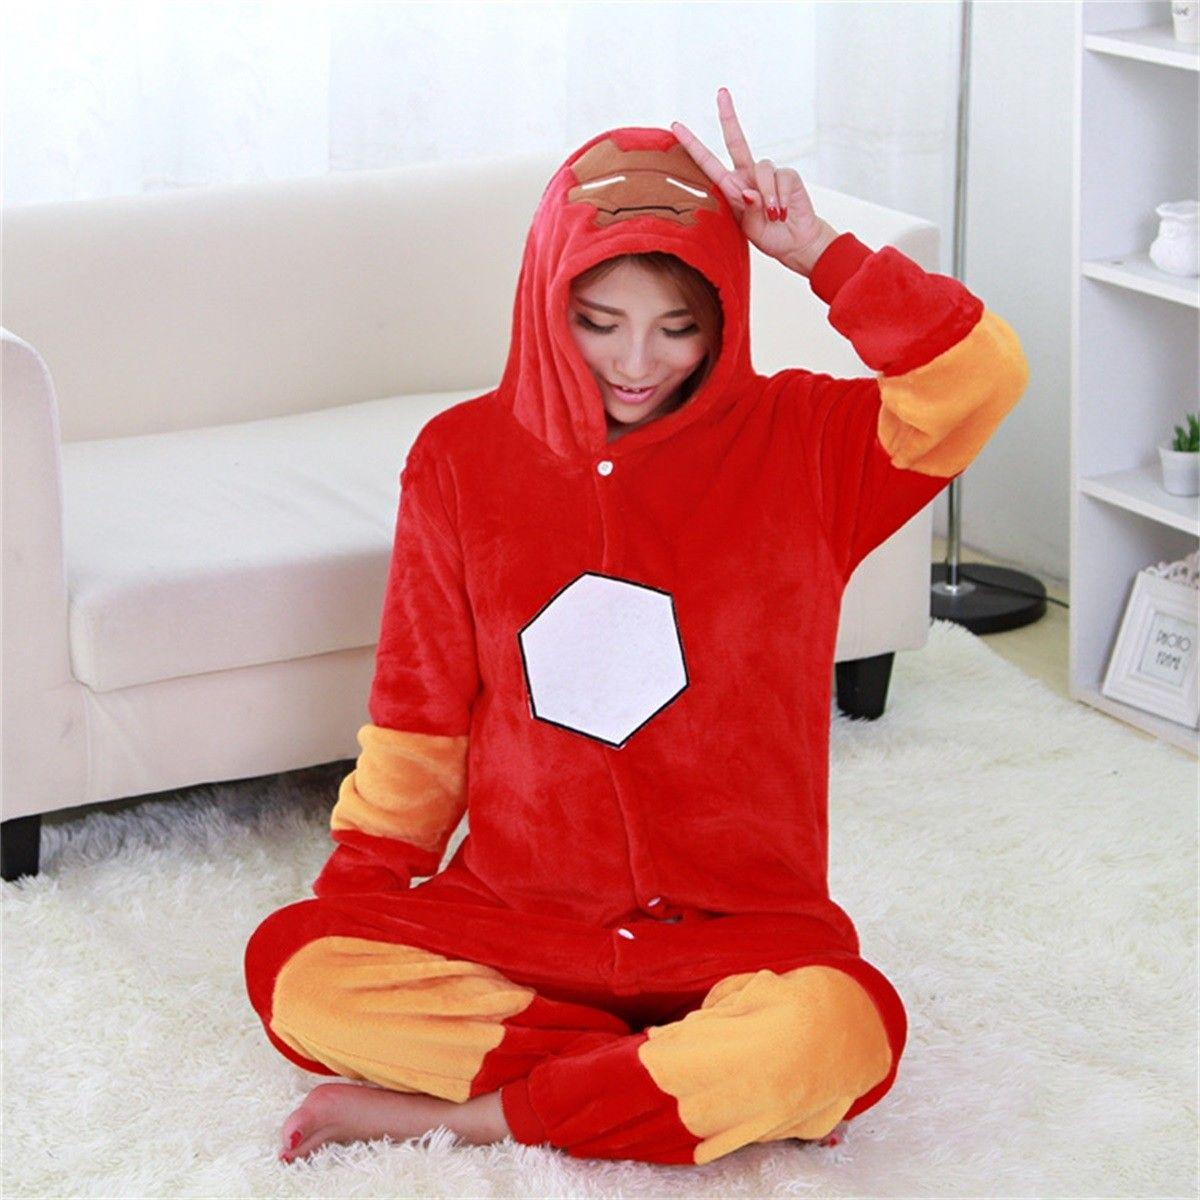 ffcc206308 kigurumi red Iron Man onesies animal pajamas for adults in 2019 ...